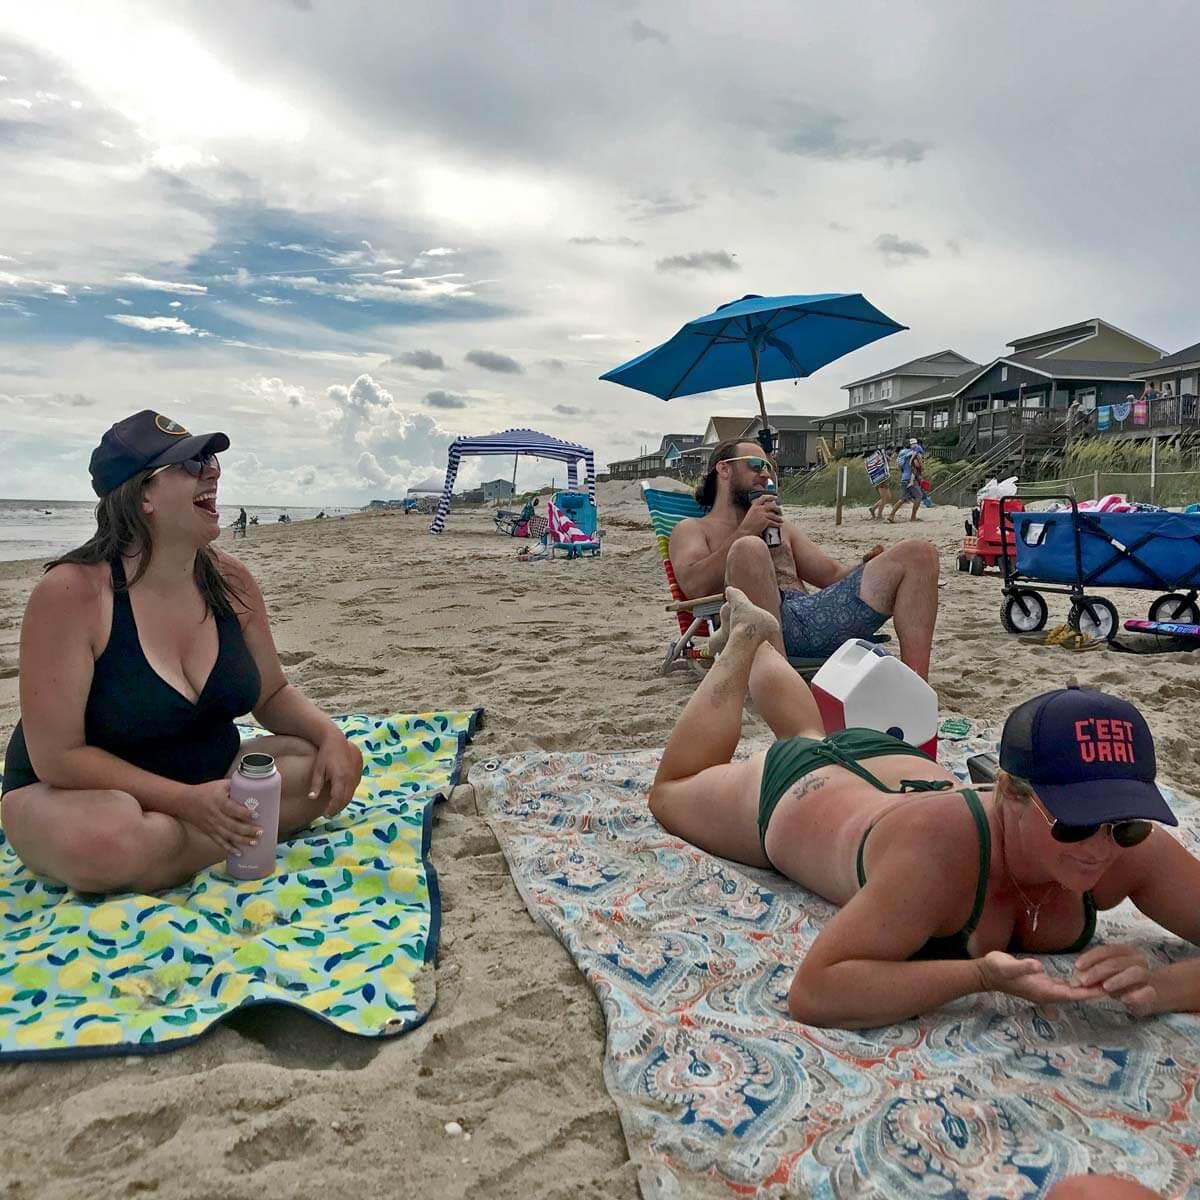 Using Tarpestry at the beach